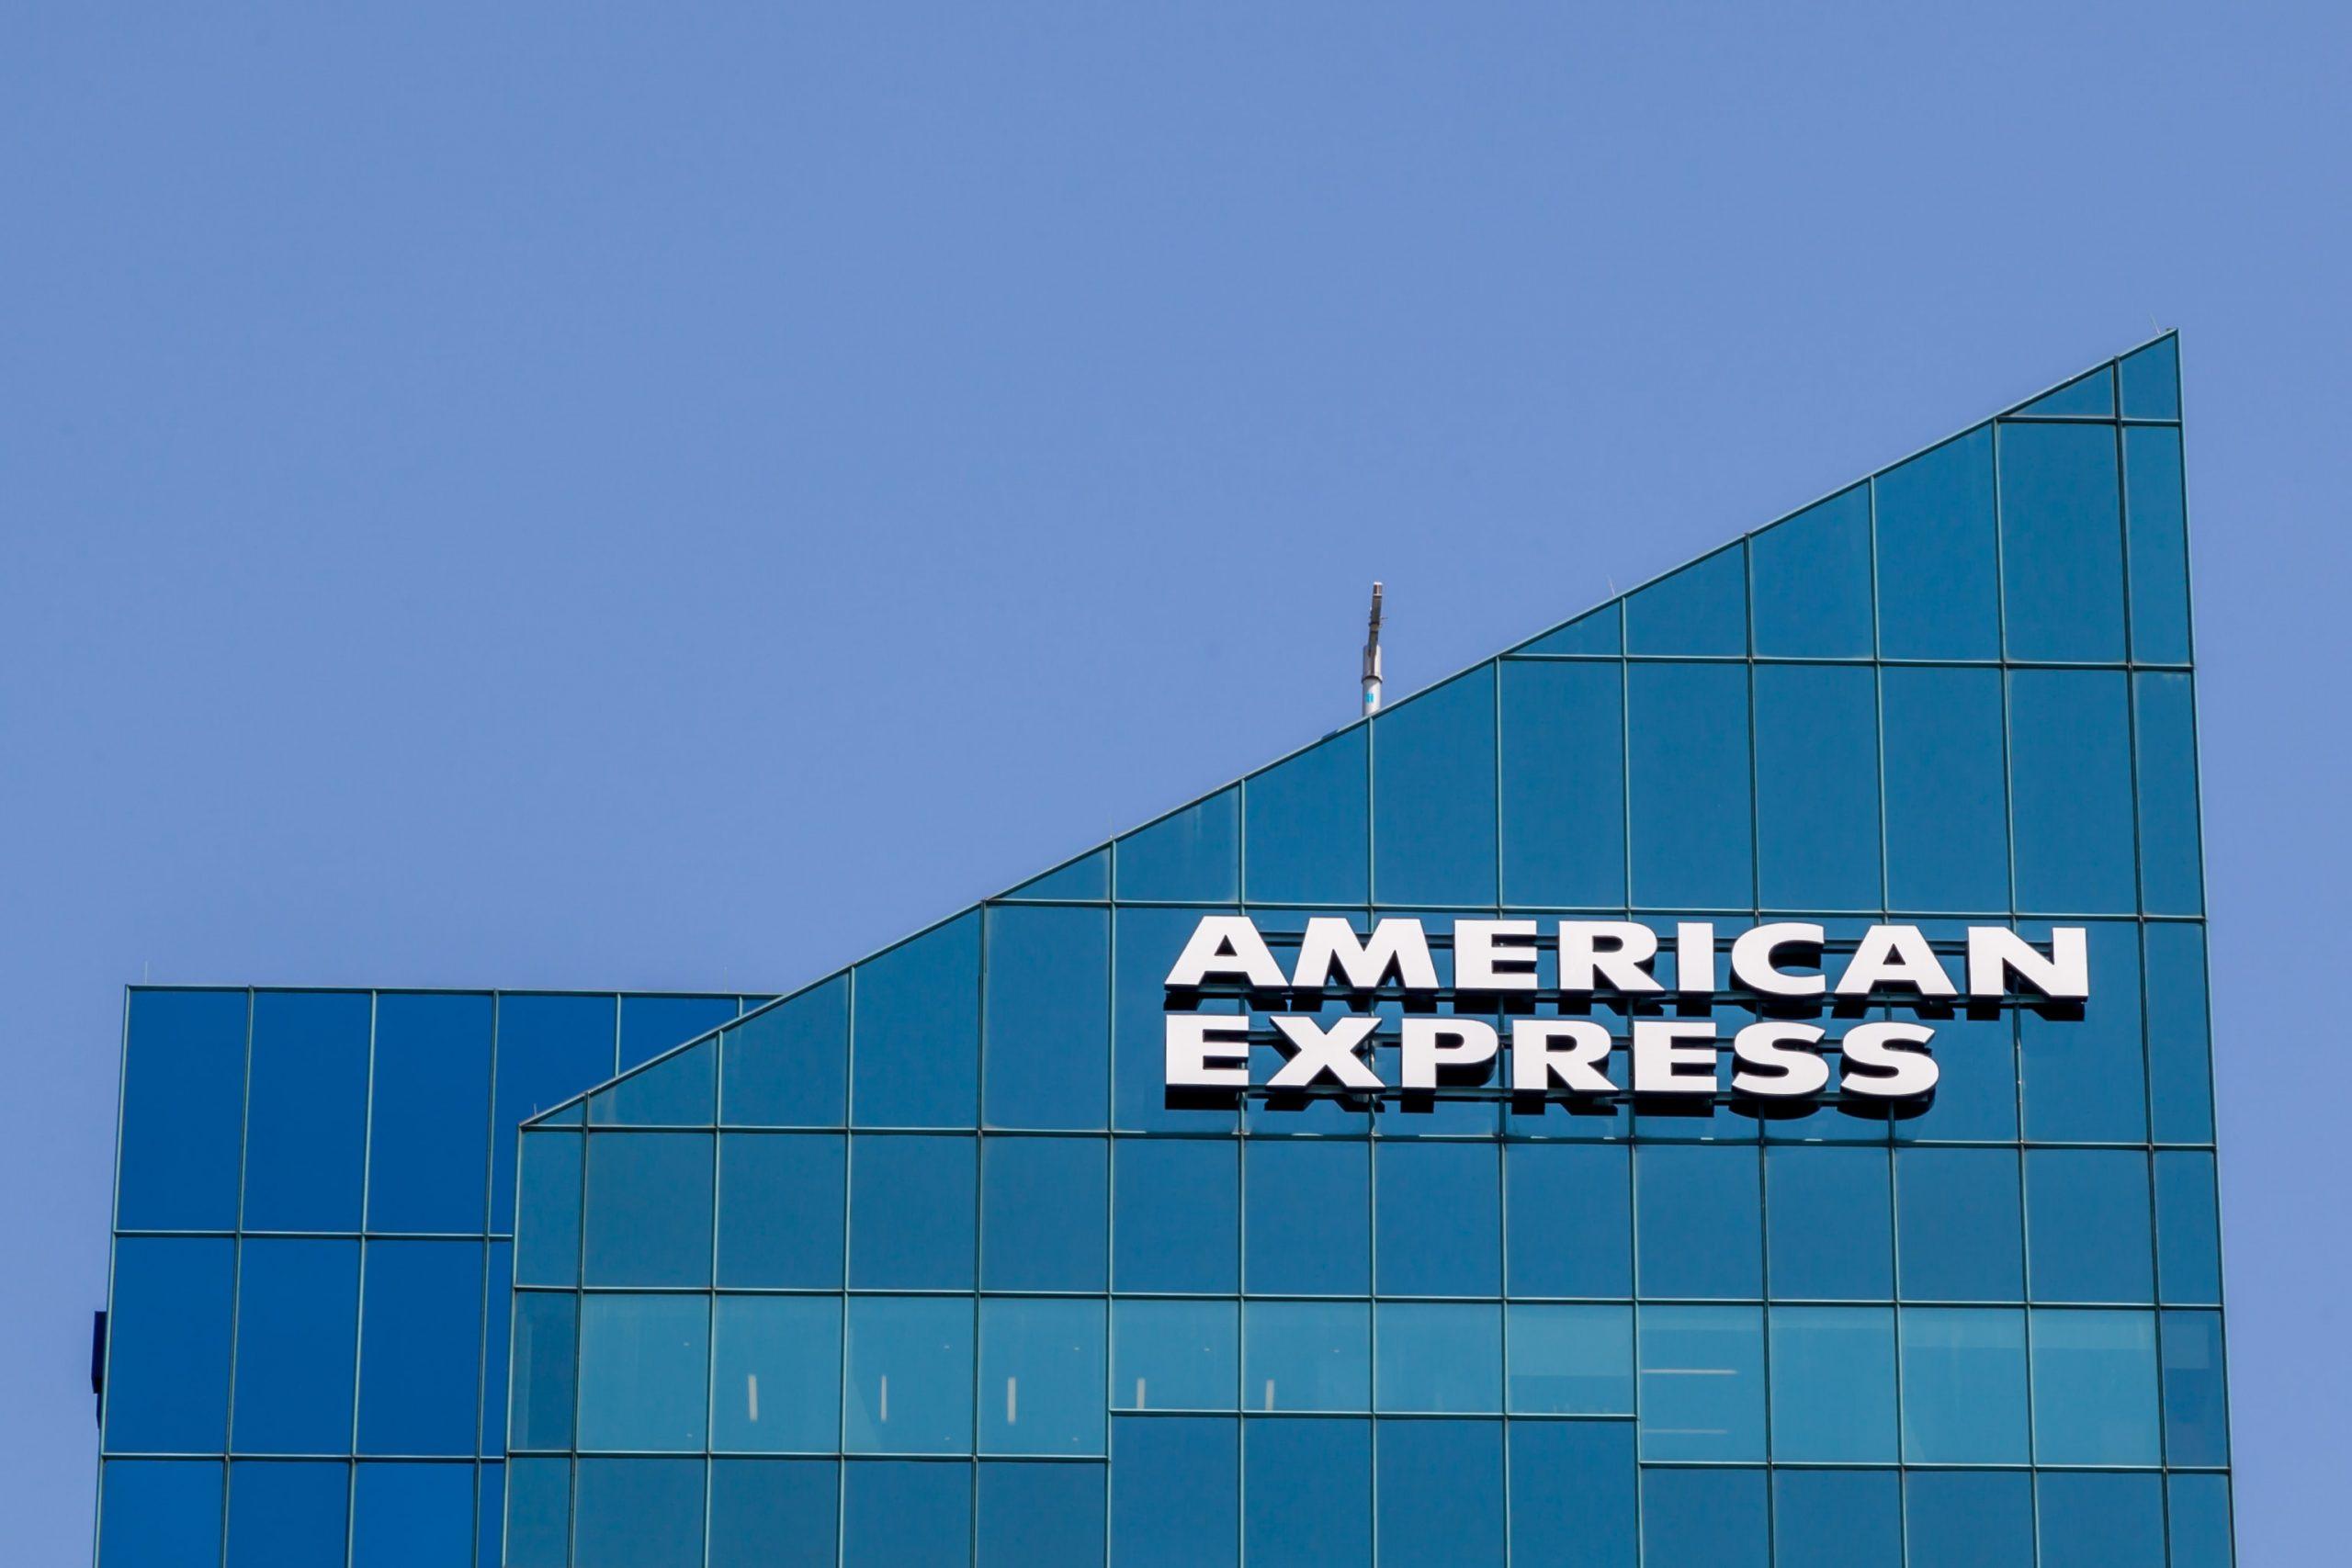 american express gebäude